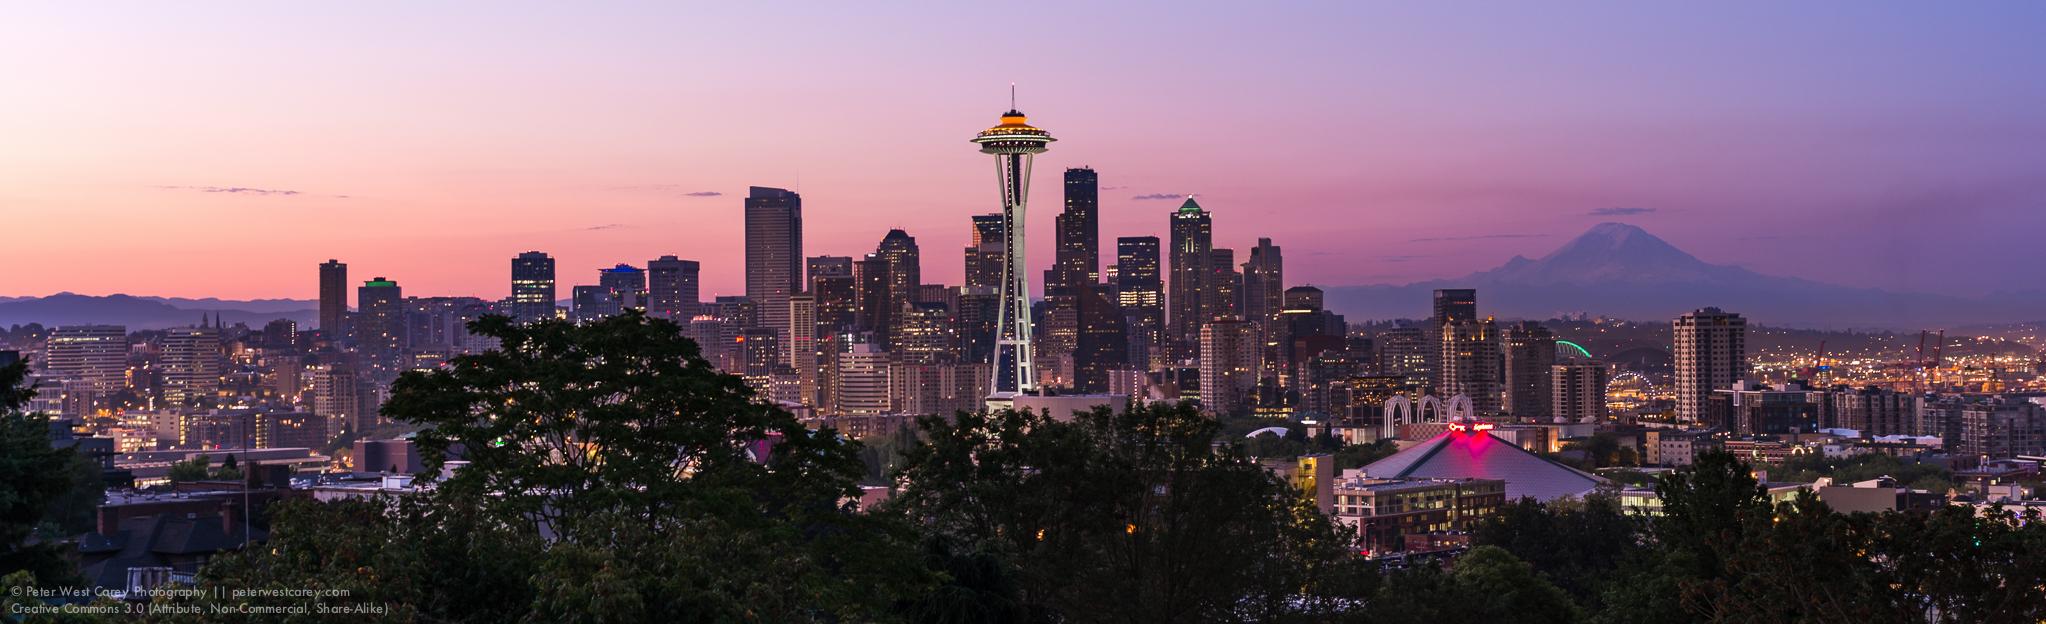 Panorama: Before Sunrise In Seattle, Washington, USA